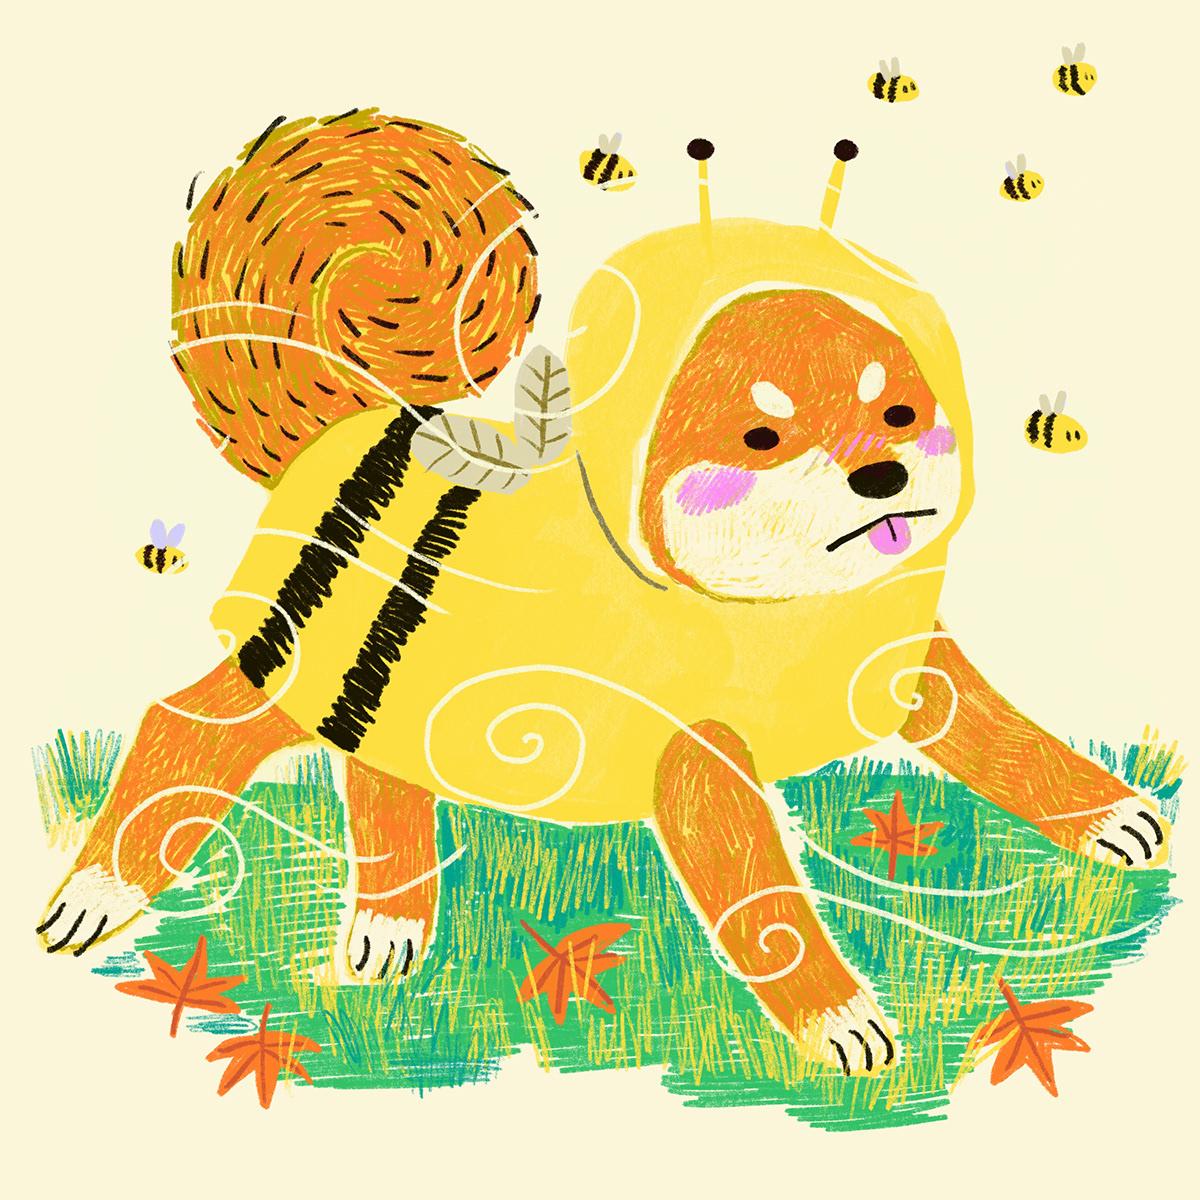 children's illustration dog illustration kidlitart kidlitillustration shibainu